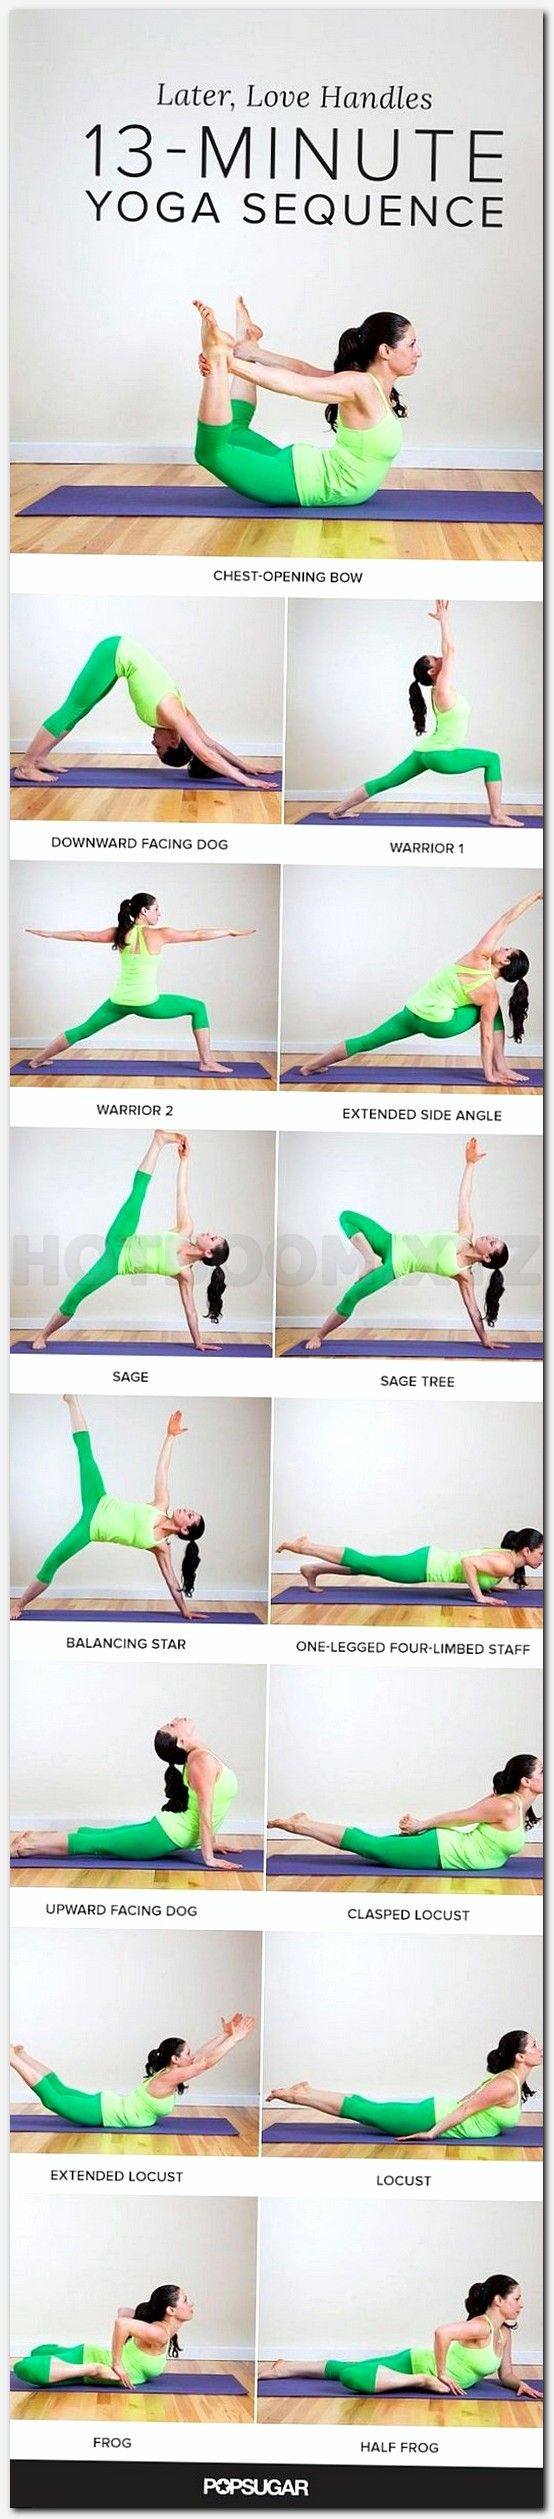 Yoga For Beginners Tips Yoga Shakti Yoga Sequences Yoga For